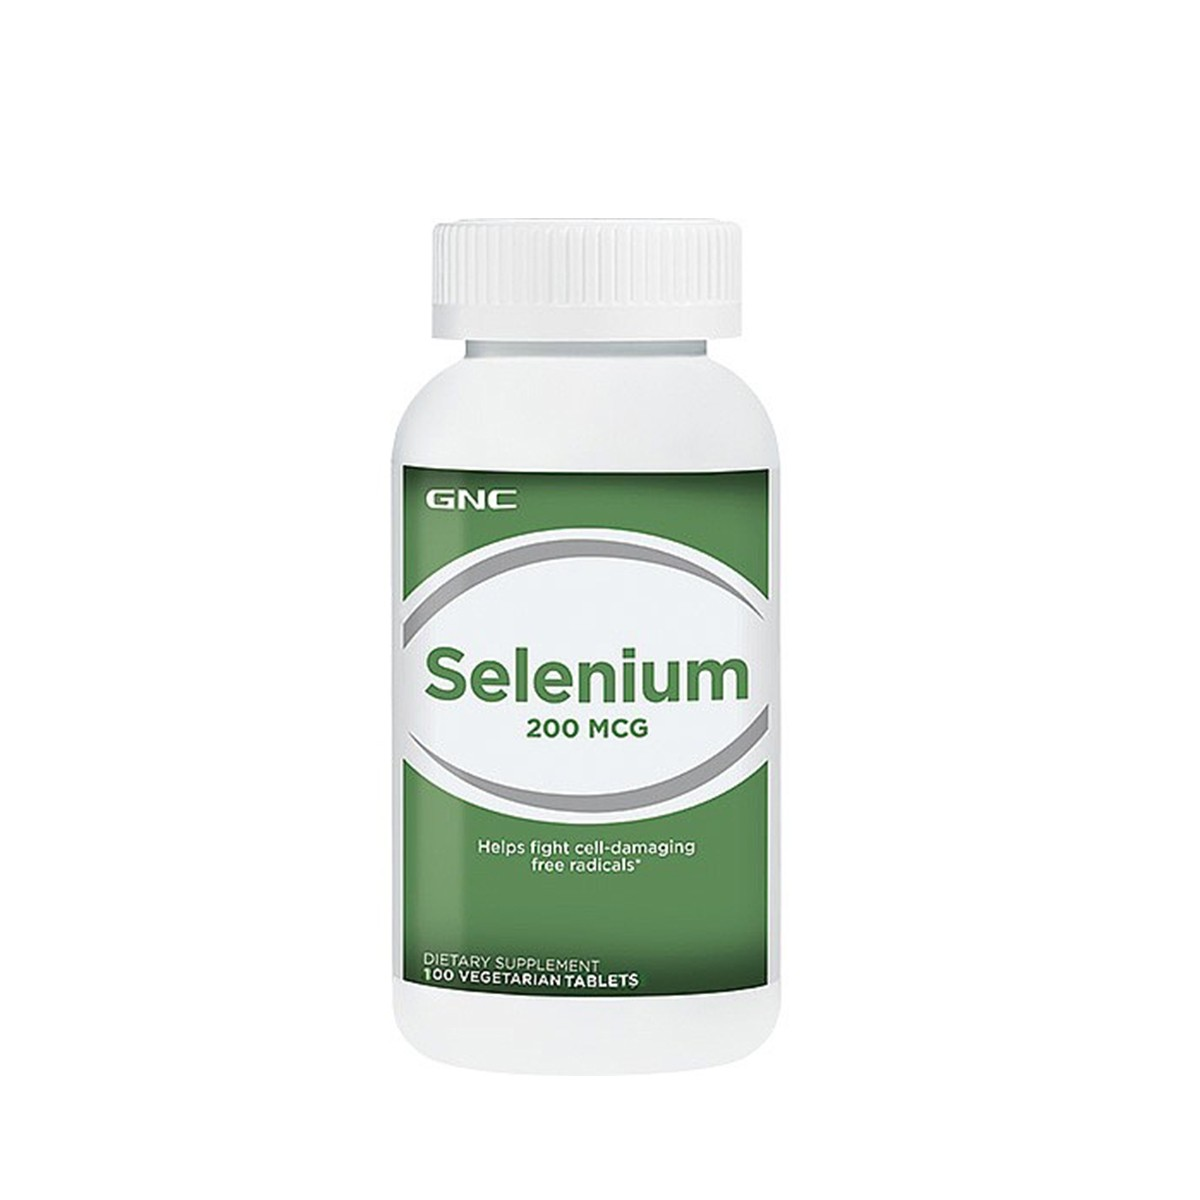 GNC Selenium 200 mcg, Seleniu Natural, 100 tb